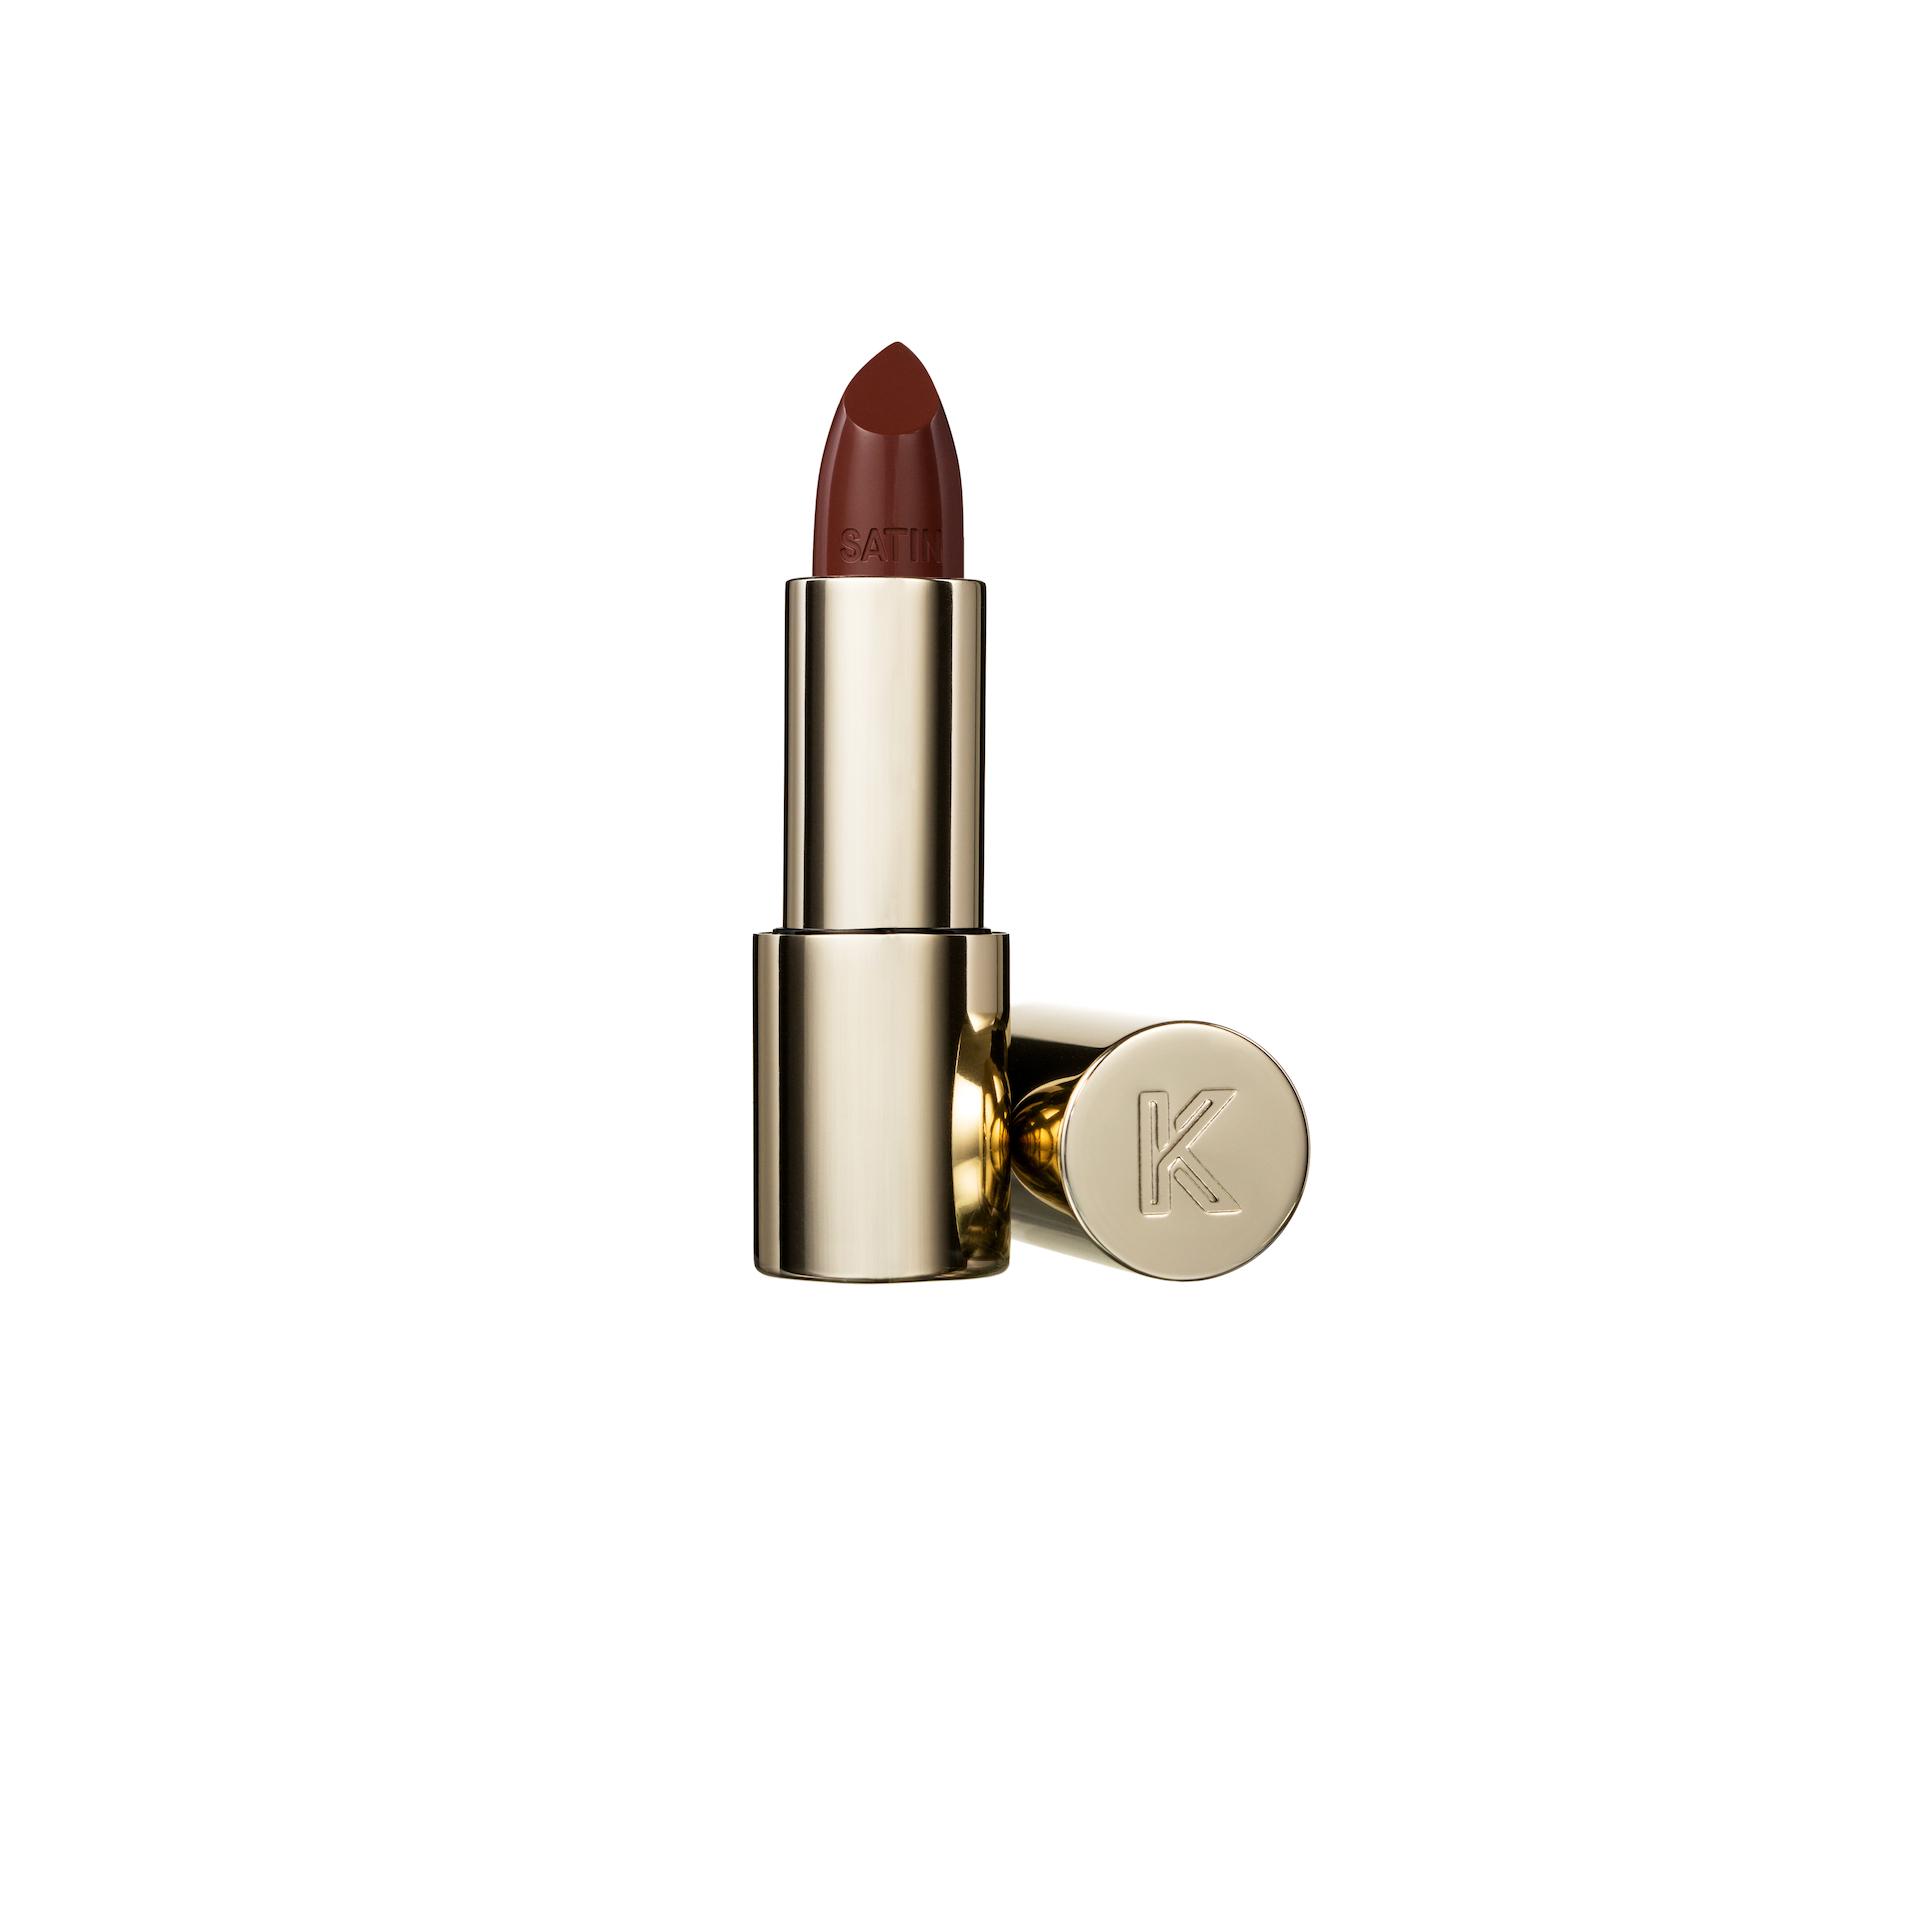 Satin Lipstick 09 Sweet Truffle